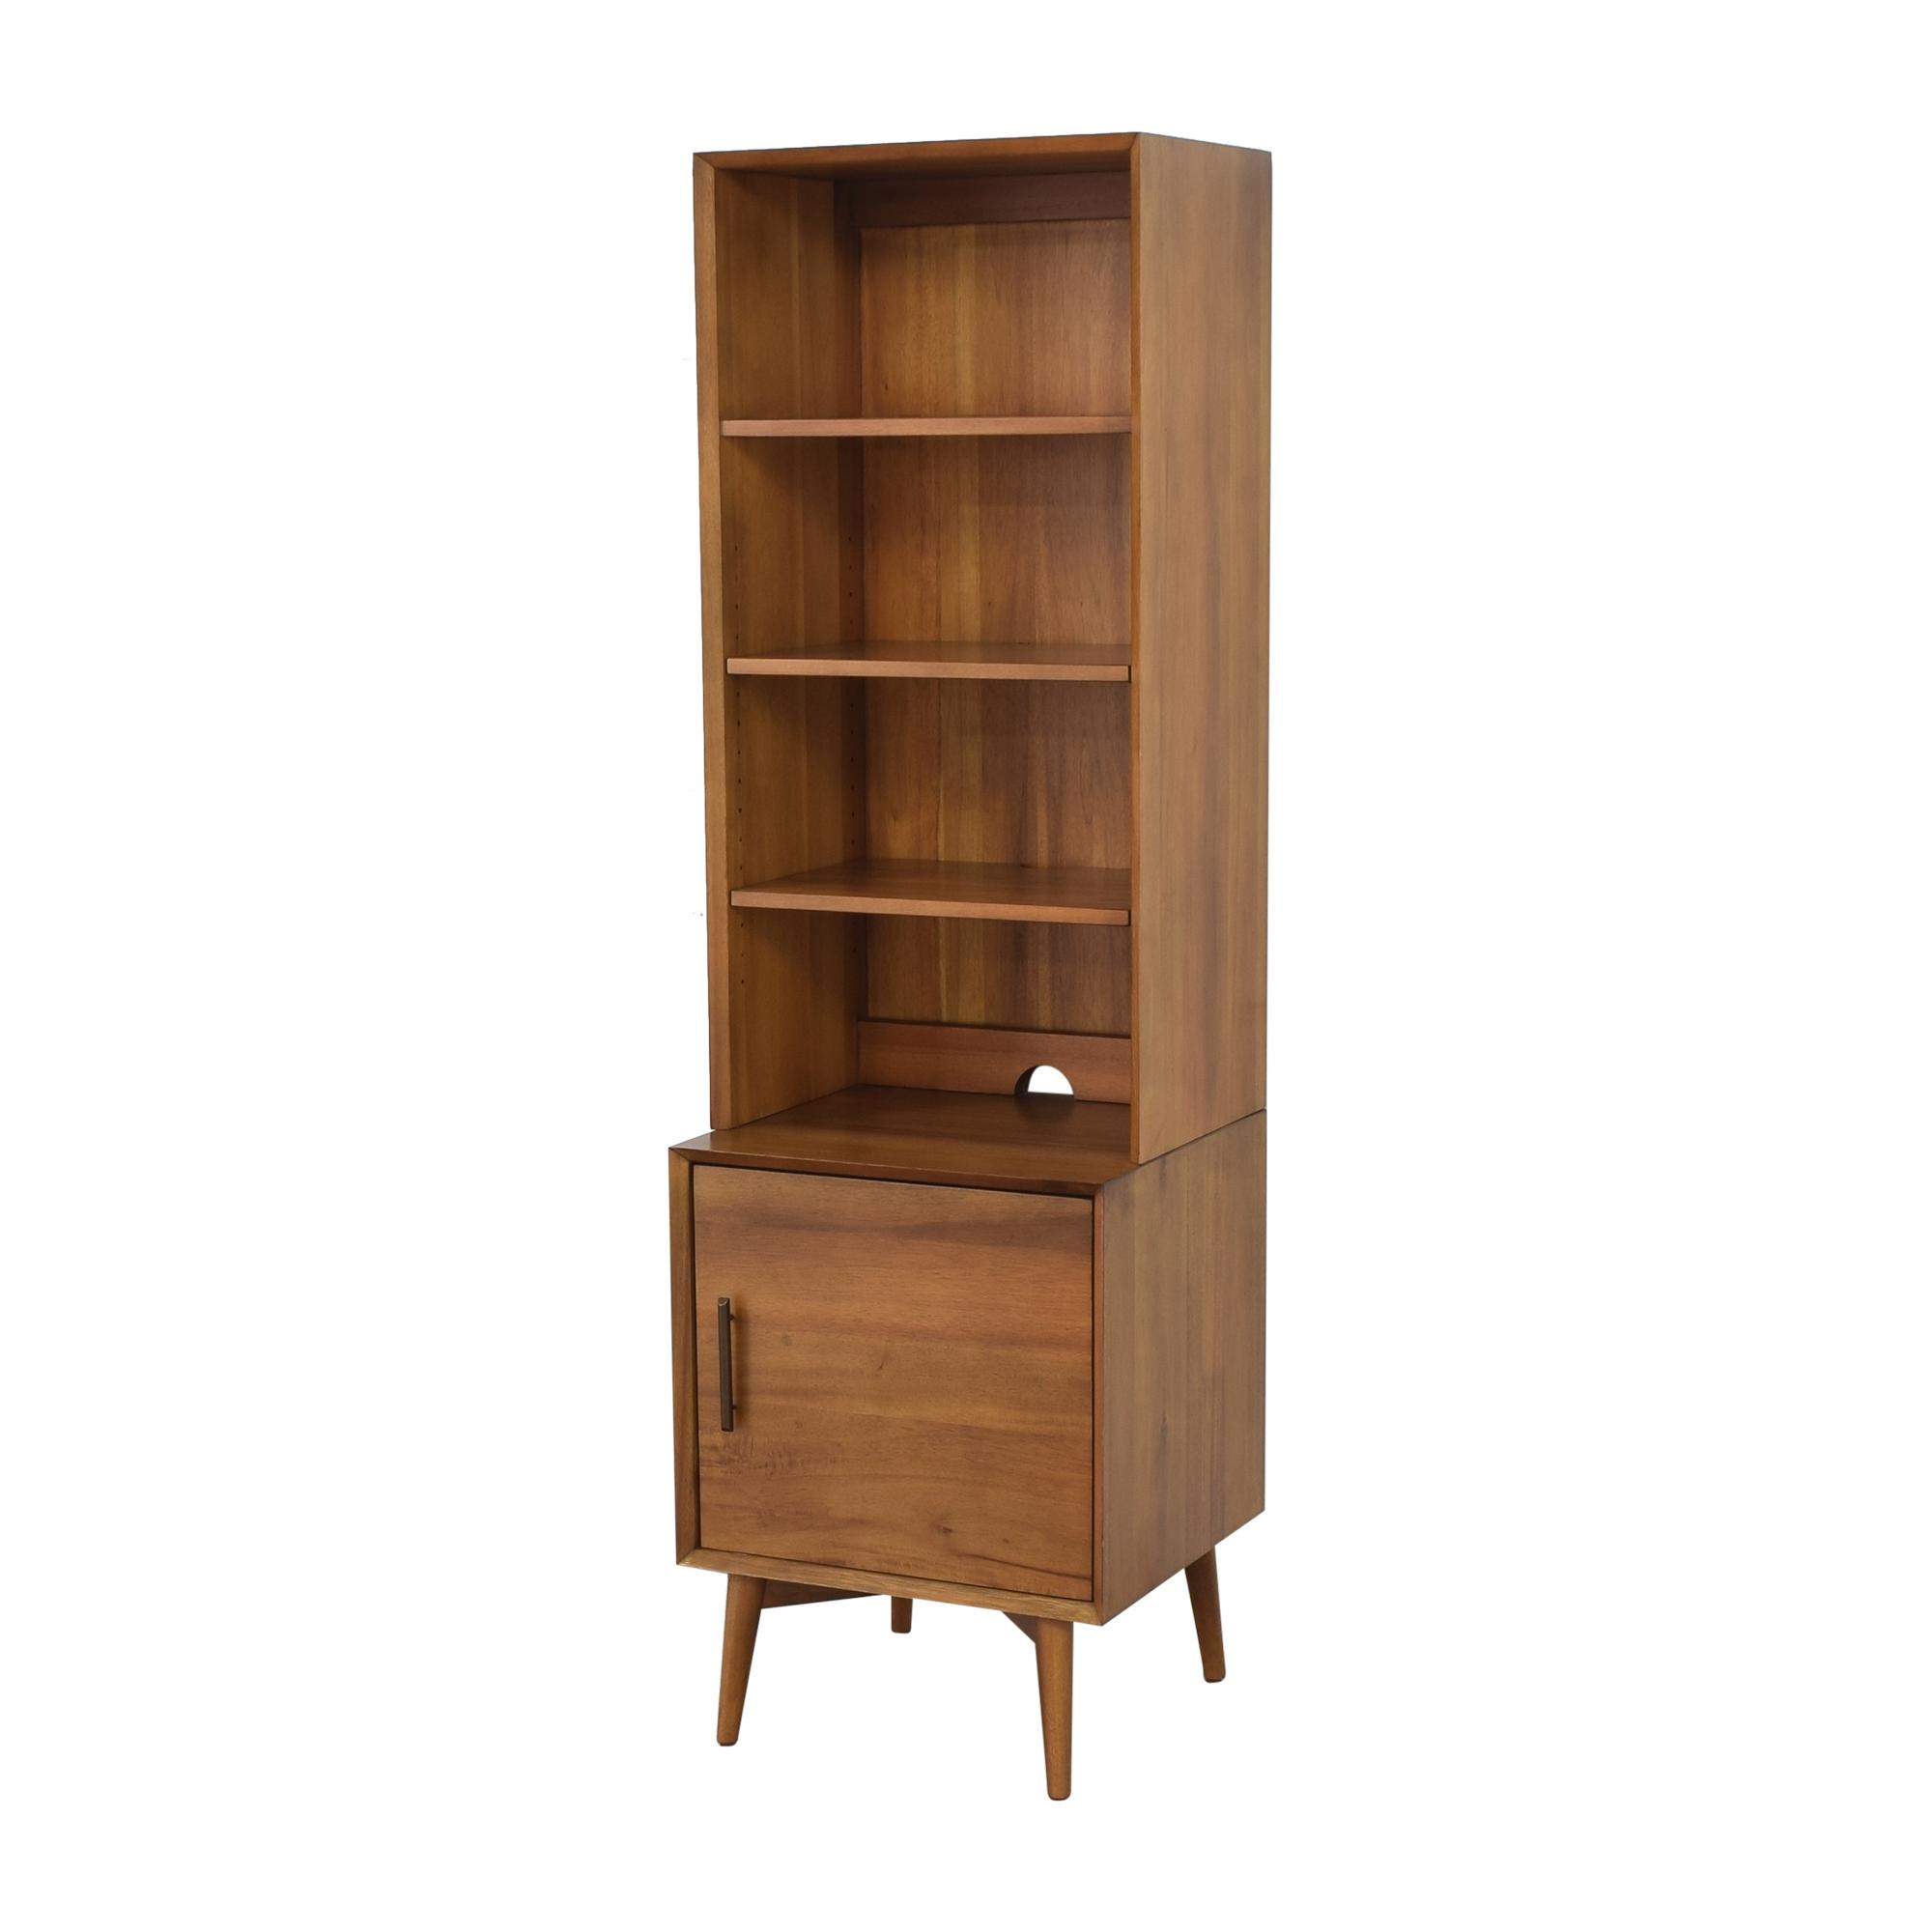 shop West Elm West Elm Mid Century Bookcase with Cabinet online